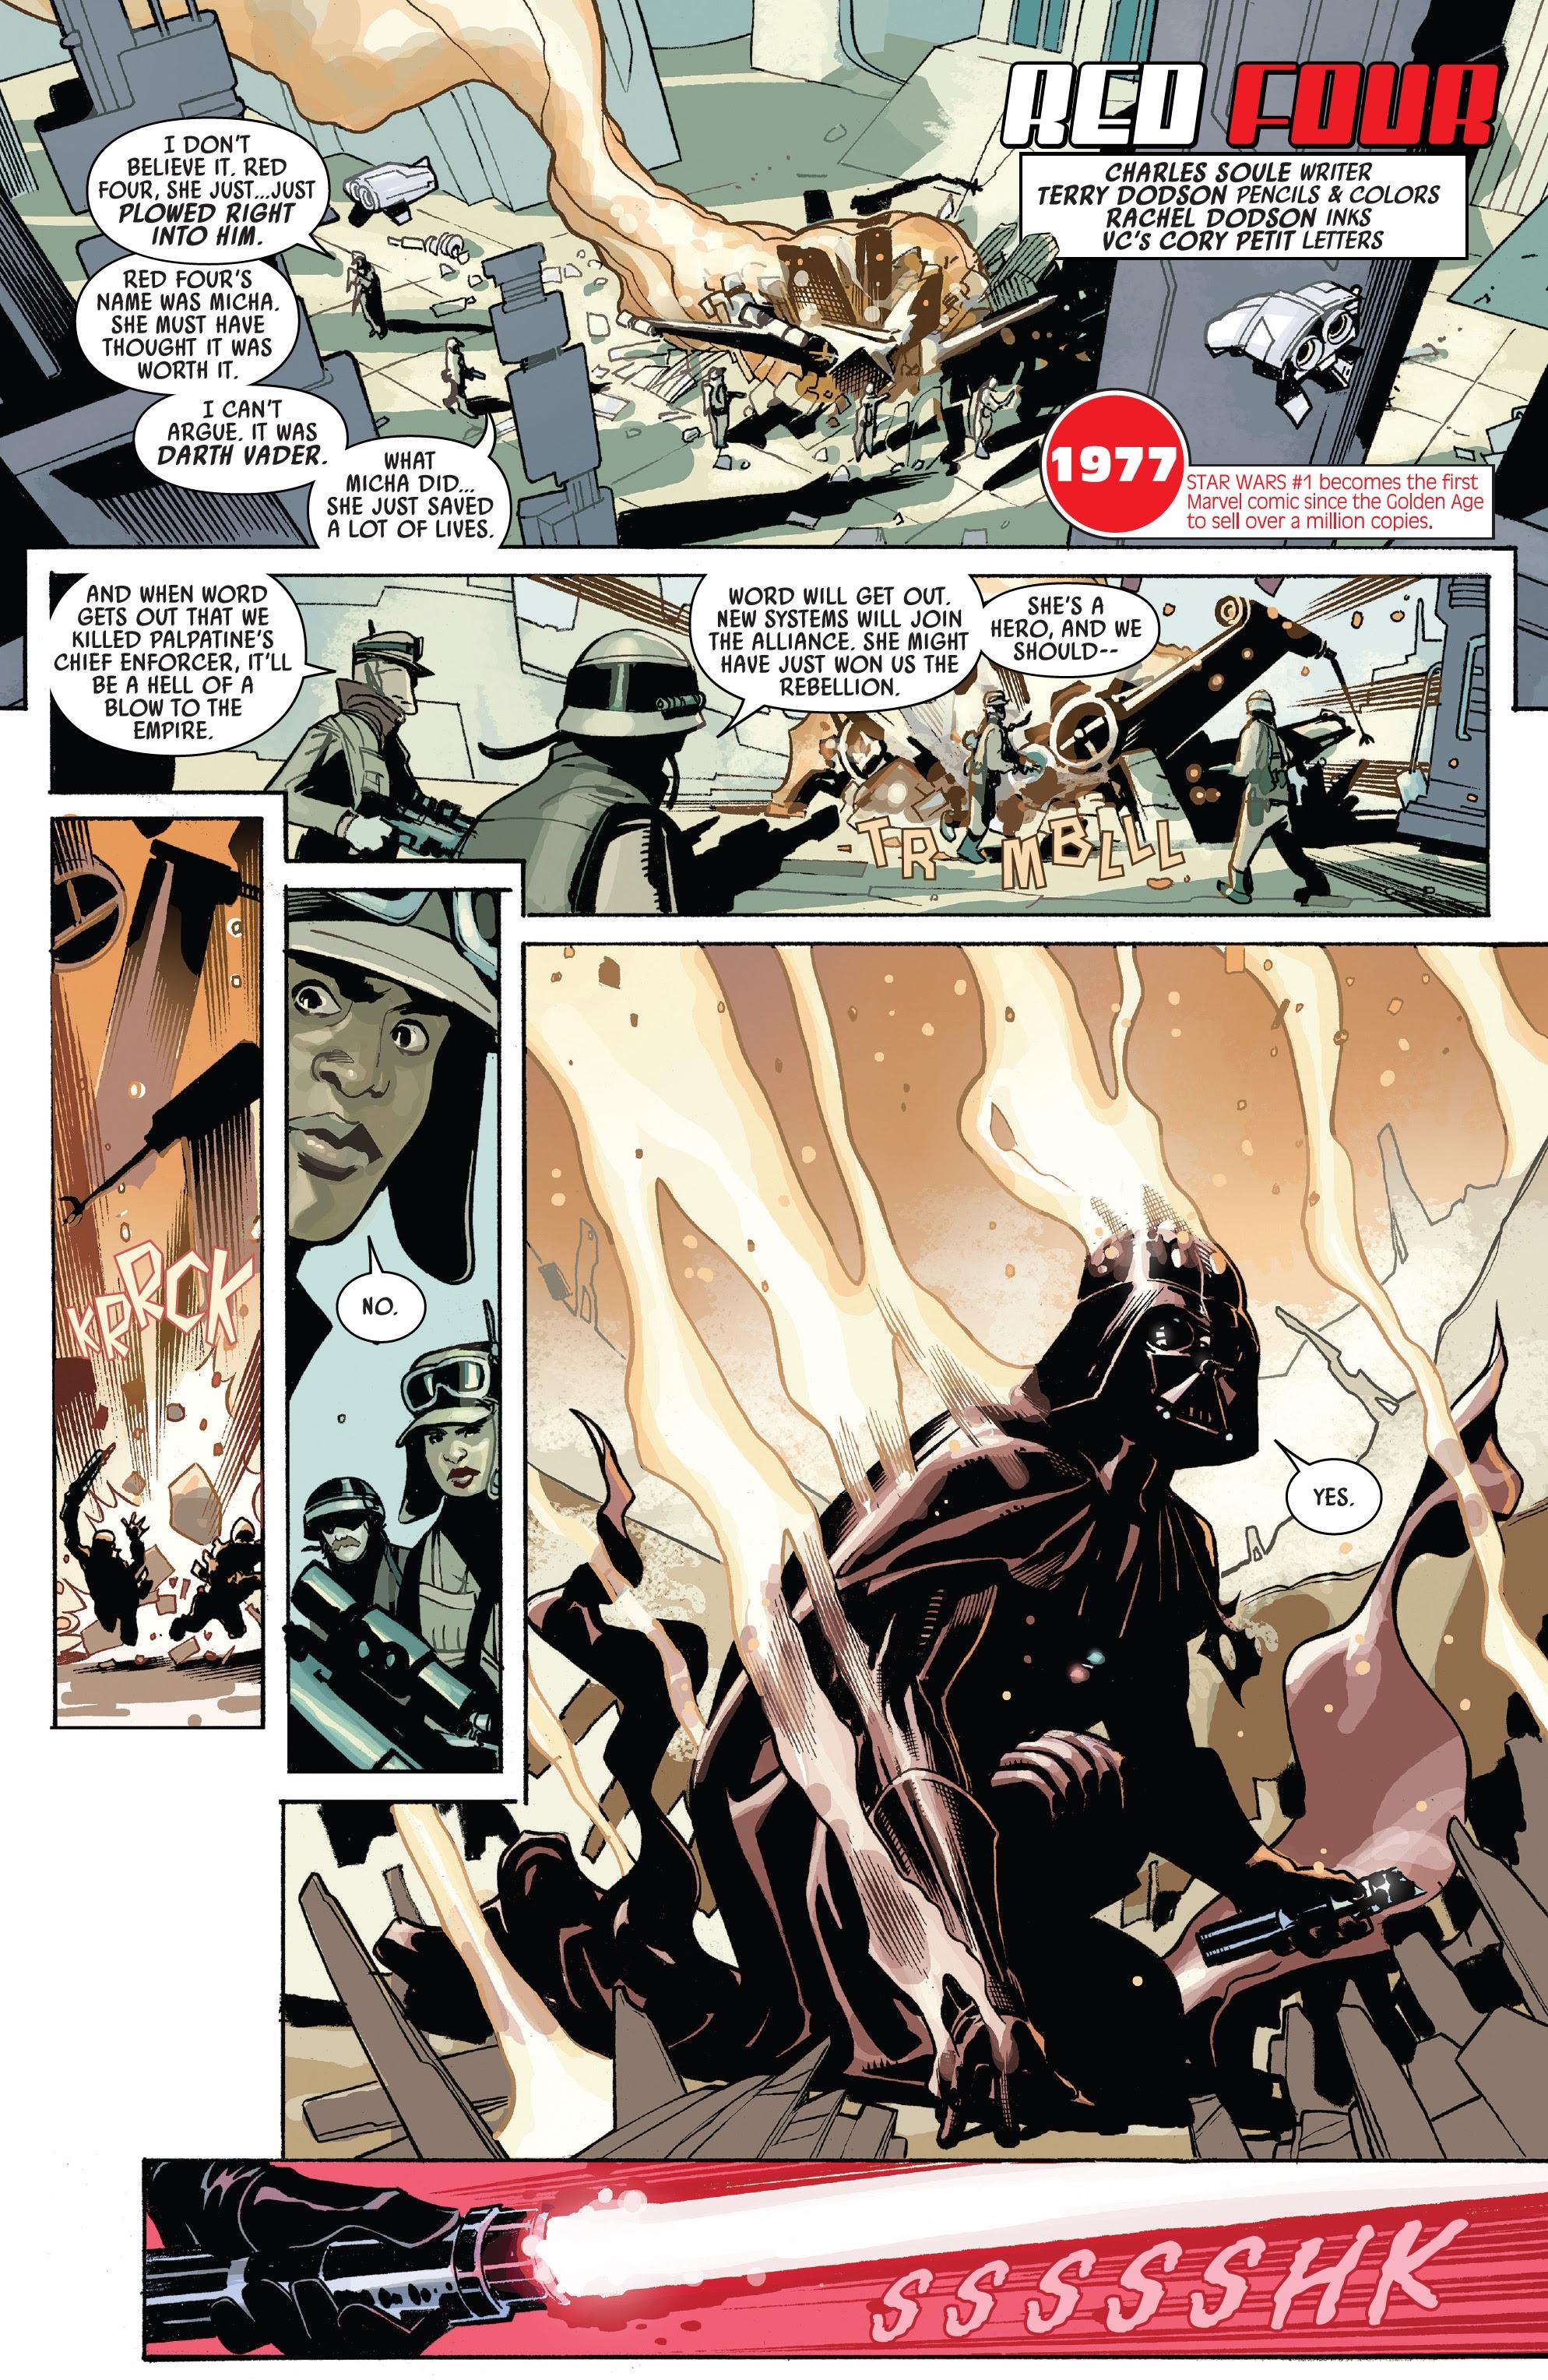 Read online Marvel Comics (2019) comic -  Issue #1000 - 41